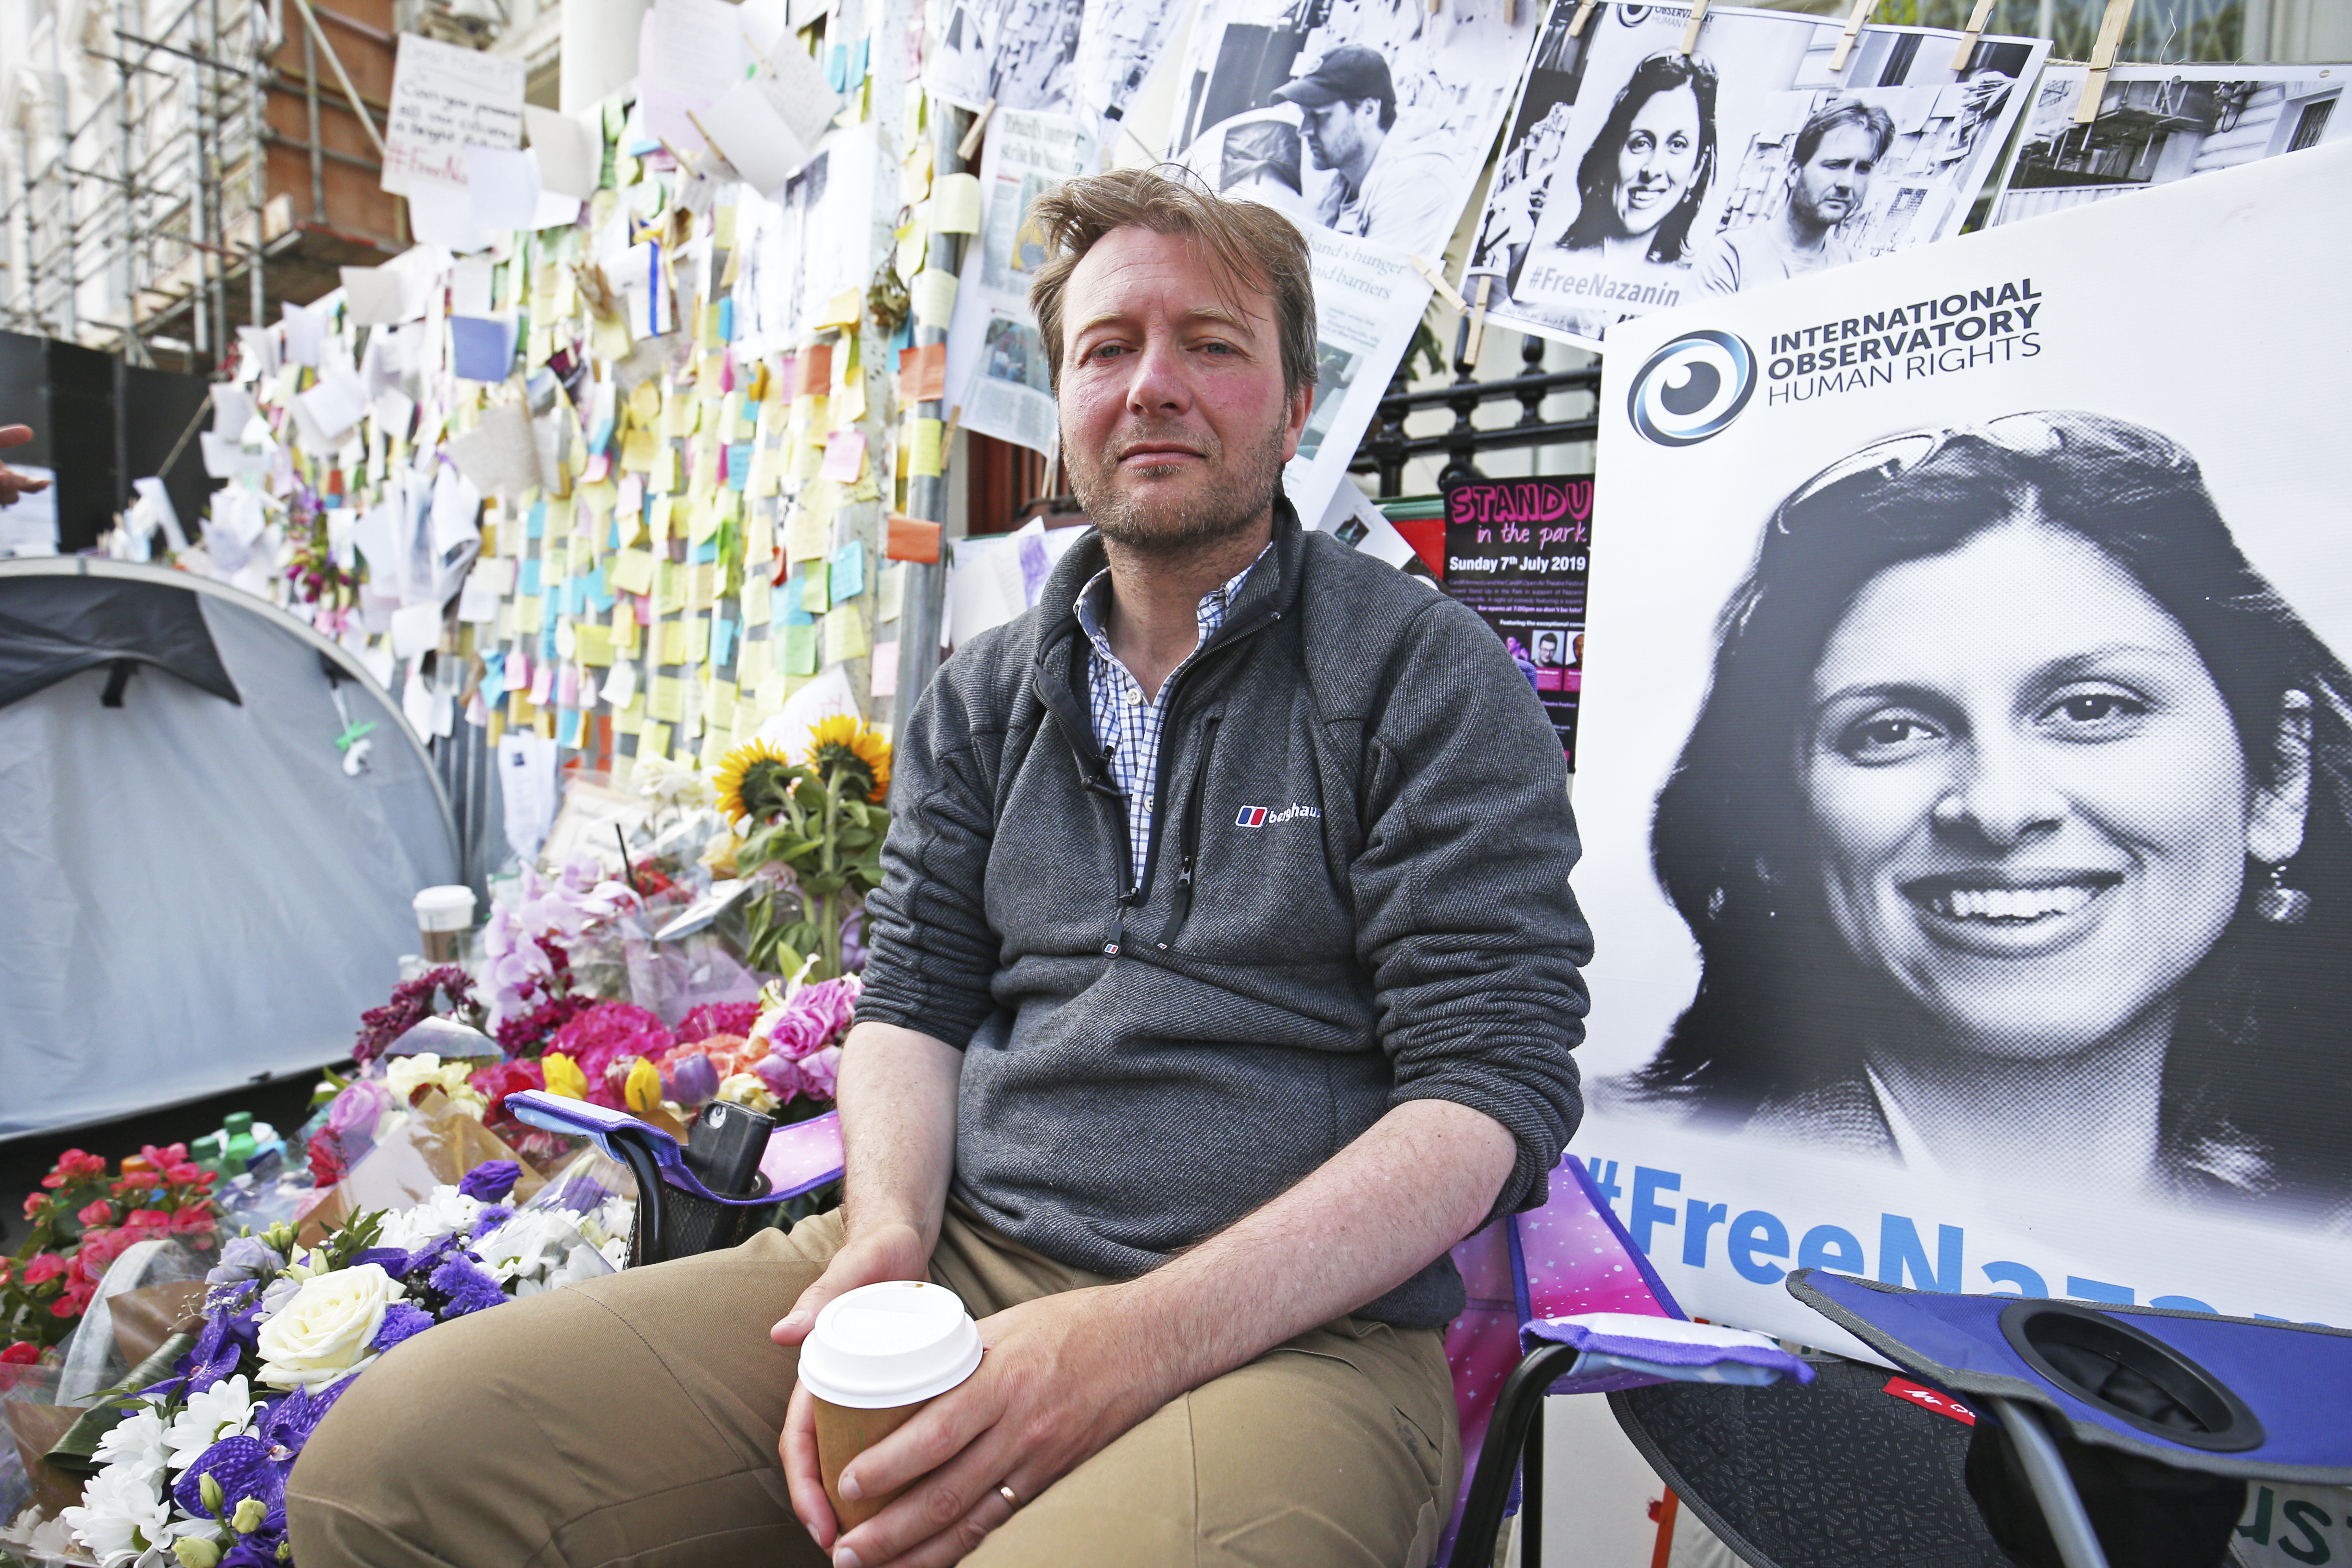 Richard Ratcliffe, the husband of detained Nazanin Zaghari Ratcliffe, outside the Iranian Embassy in London on June 29, 2019.